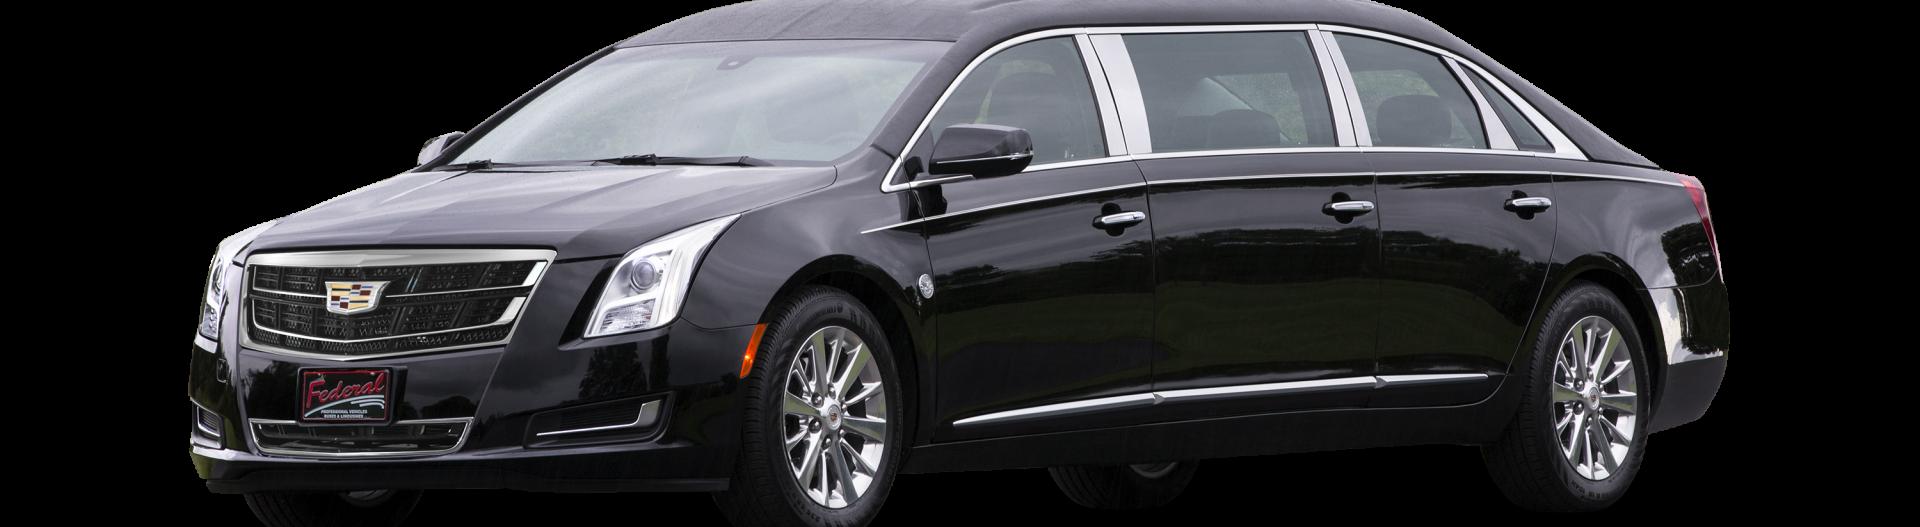 "2016 Cadillac XTS 48"" Raised Roof Limo"